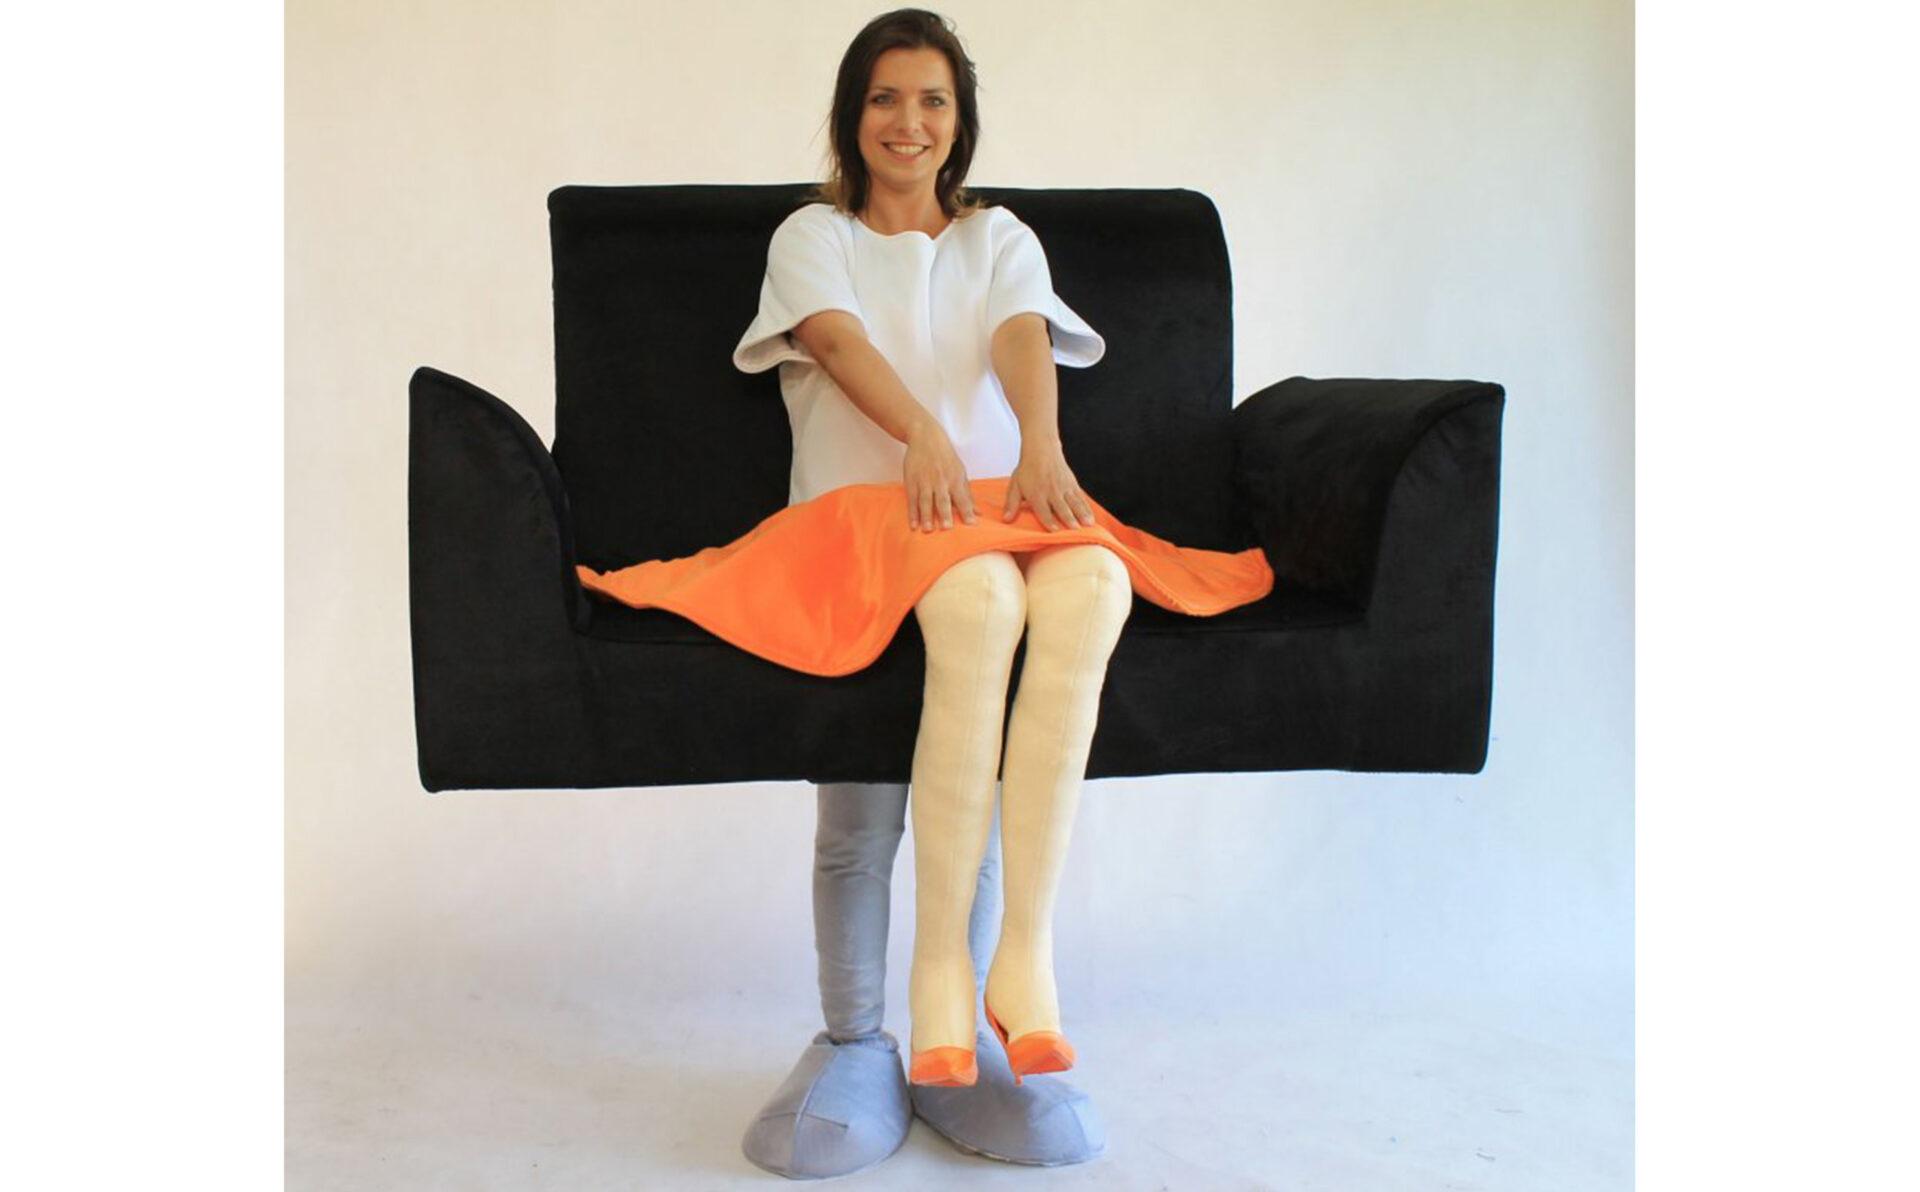 beitragsbild-walking-act-sofa-frau